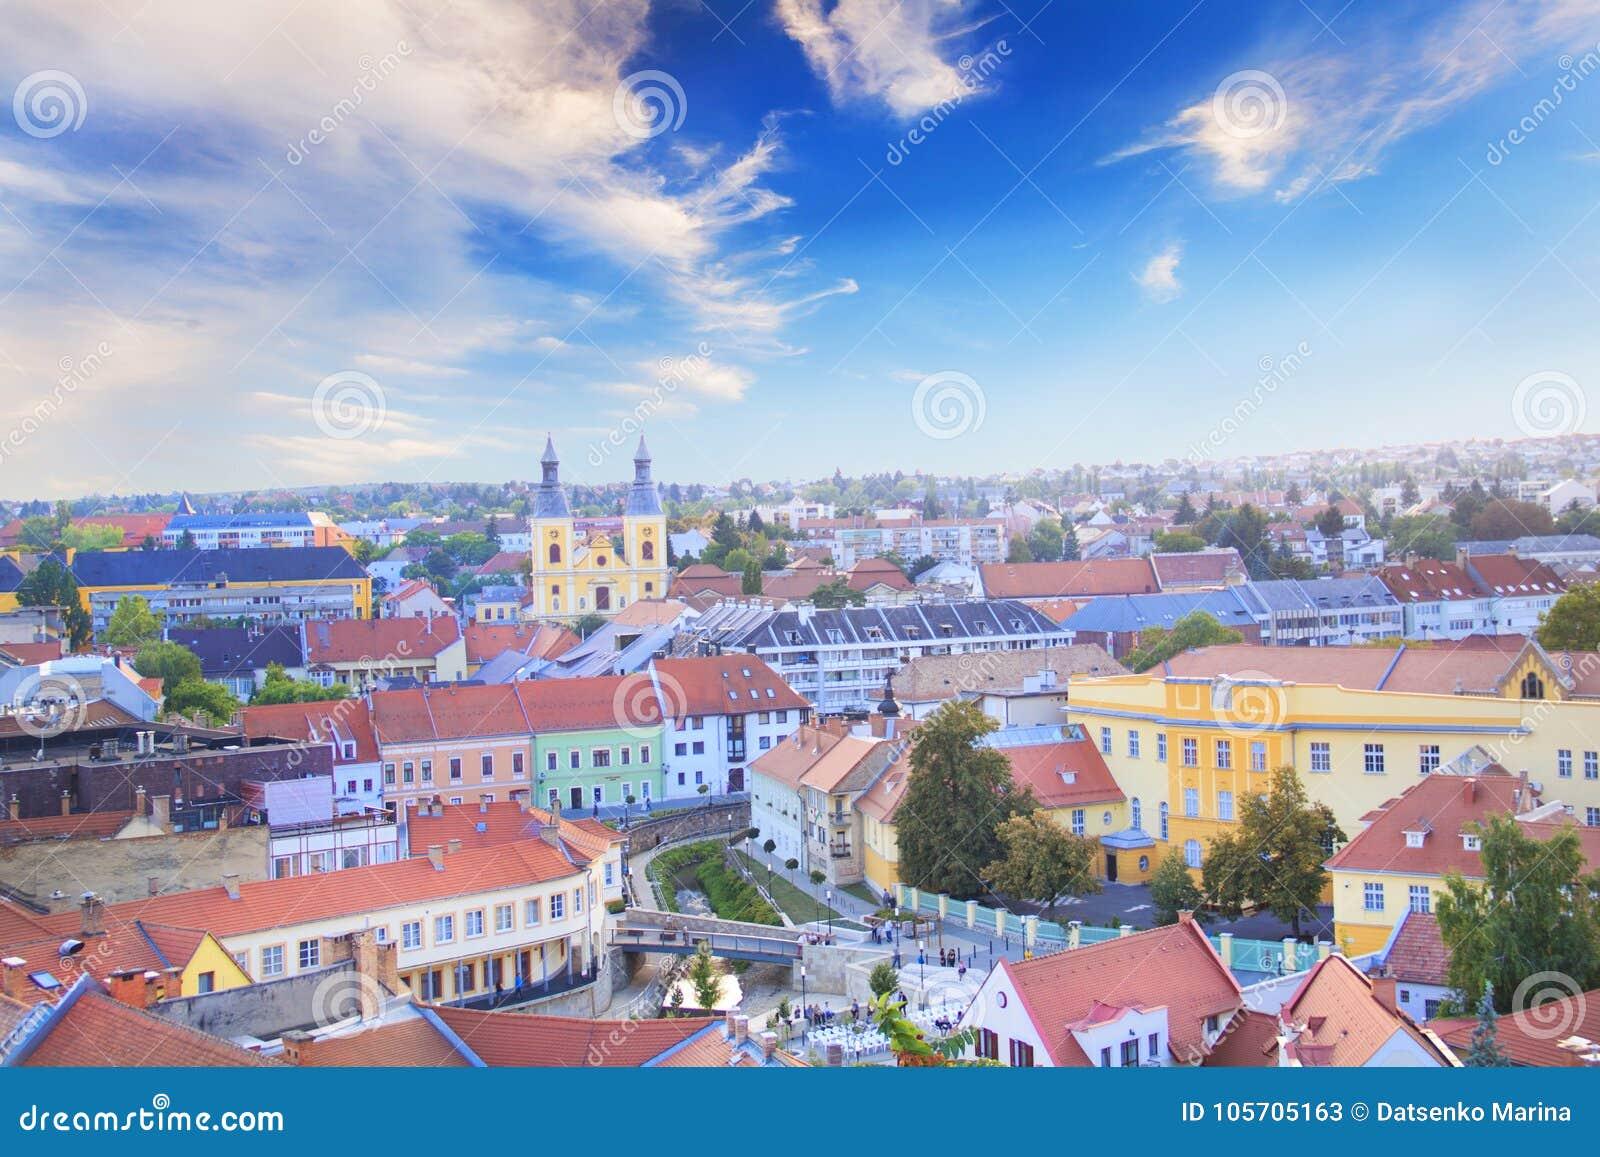 Minorit教会和市的全景的美丽的景色埃格尔,匈牙利